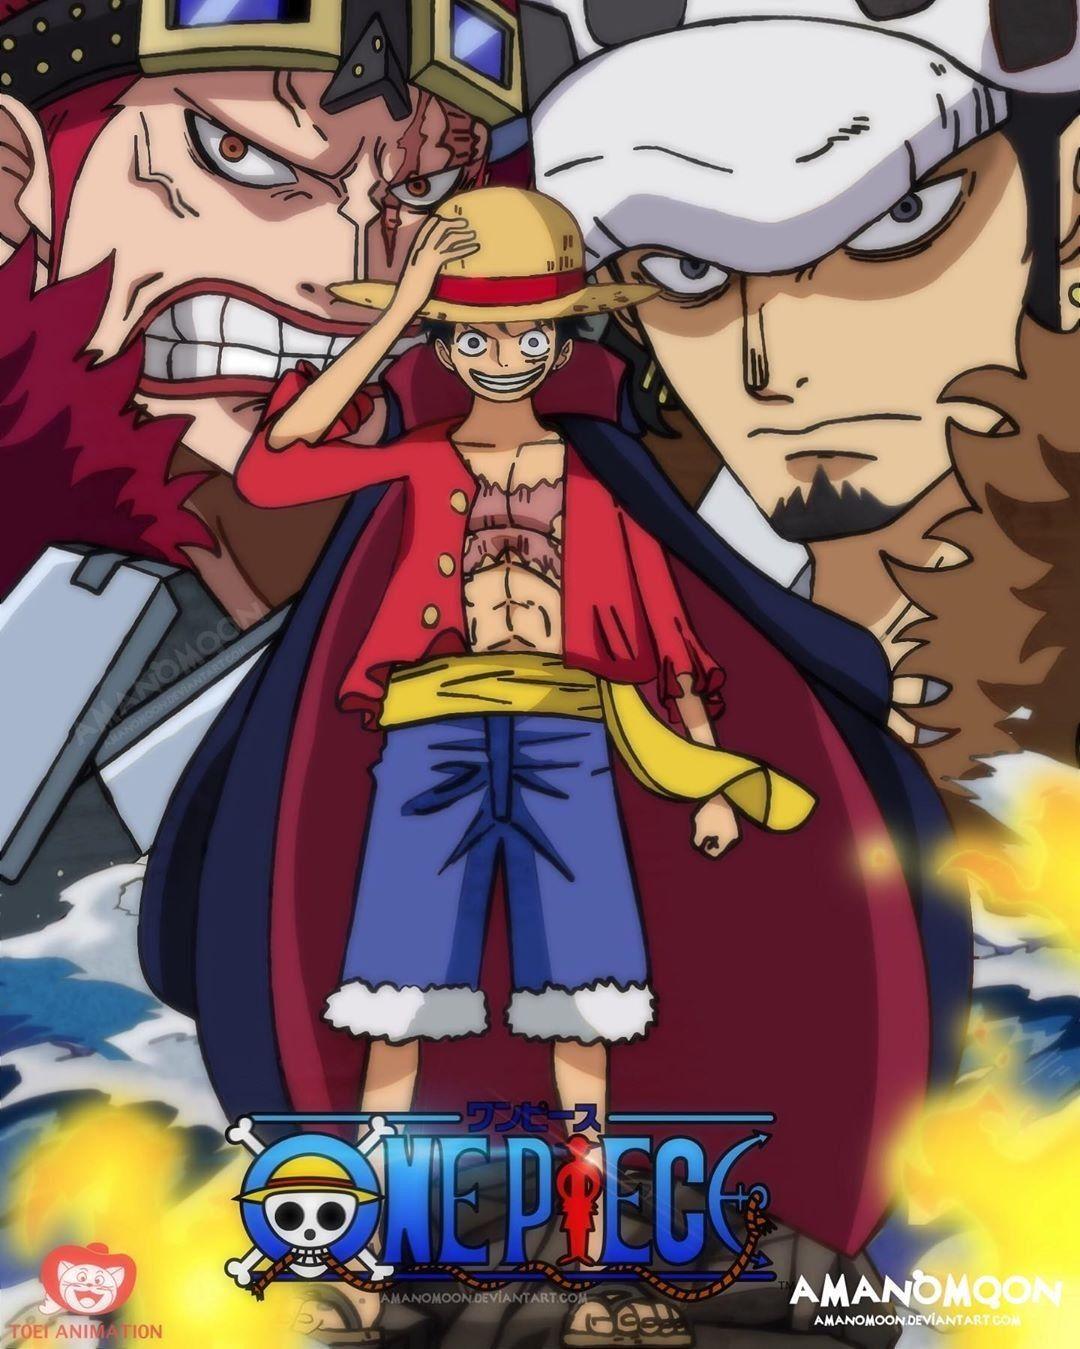 supernova trio one piece manga manga anime one piece one piece luffy